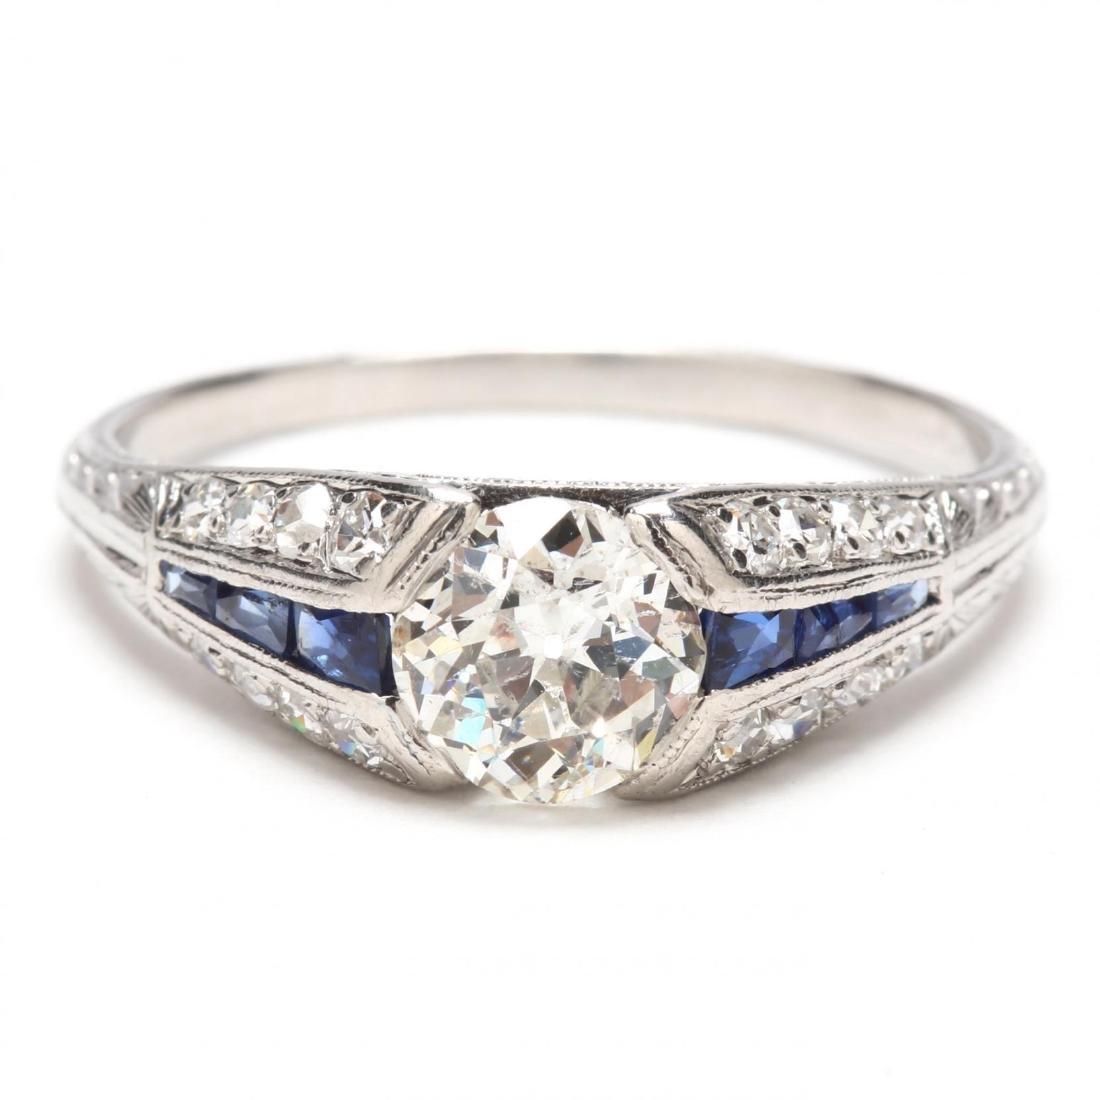 Art Deco Platinum, Diamond, and Sapphire Ring